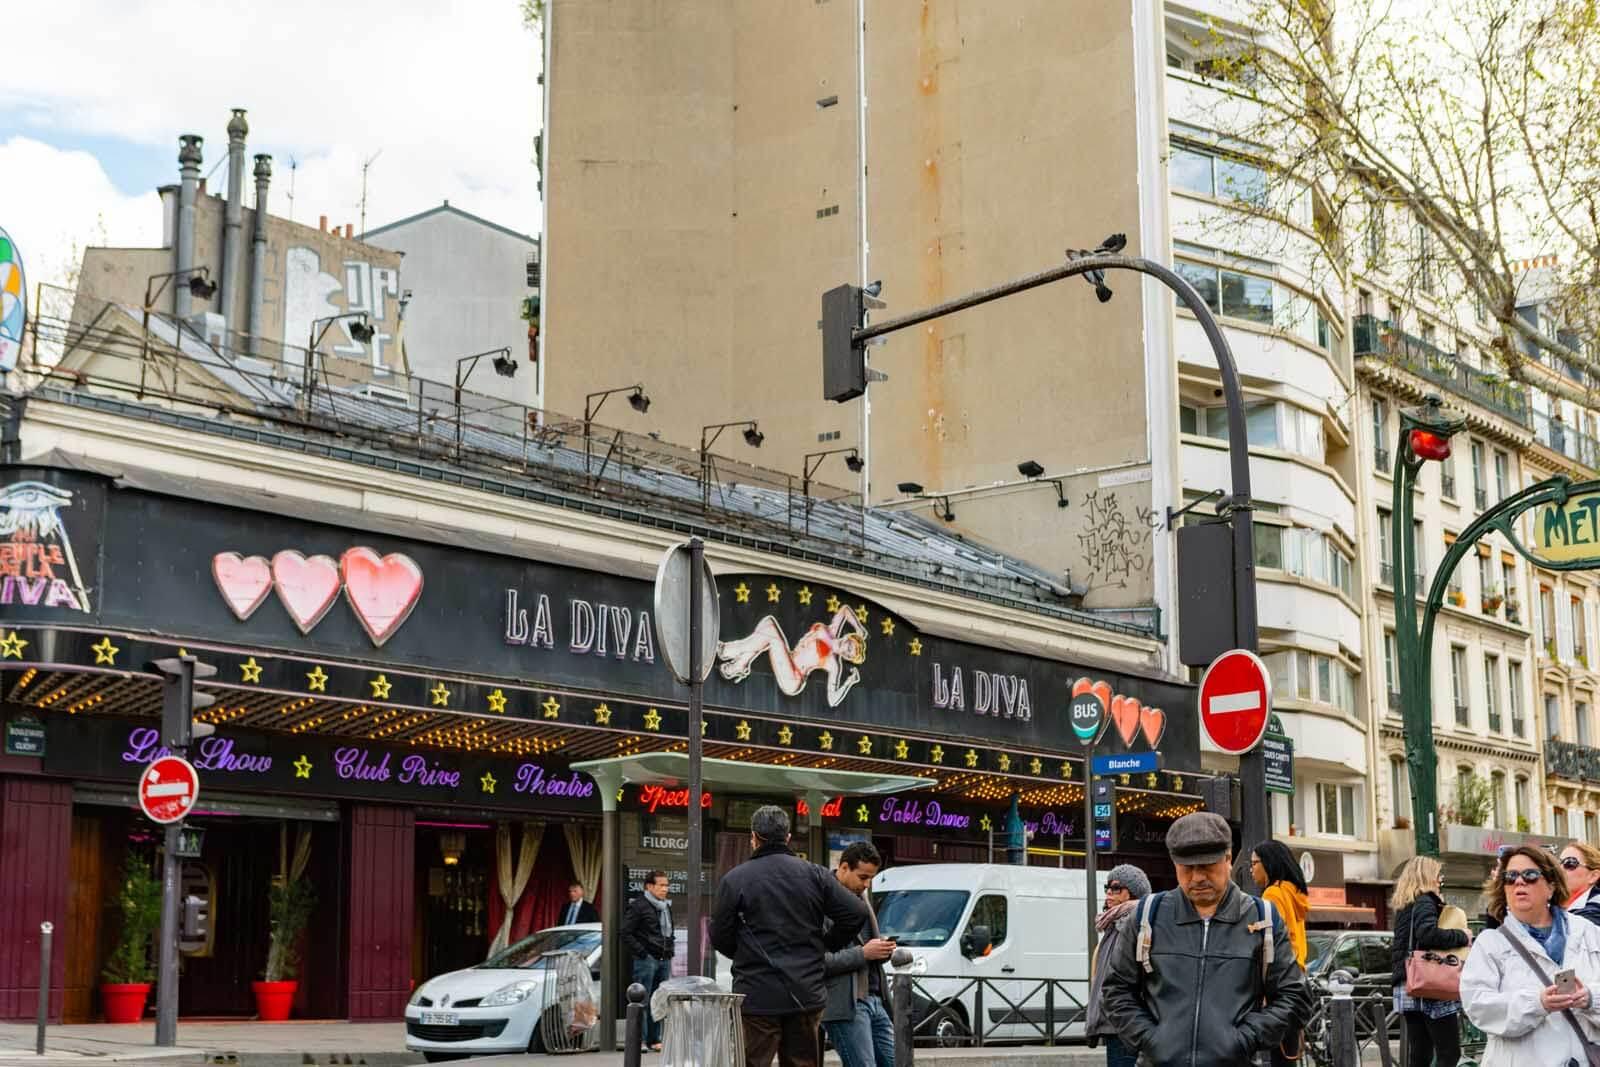 La Diva club and cabaret on Boulevard de Clichy in Montmartre Paris